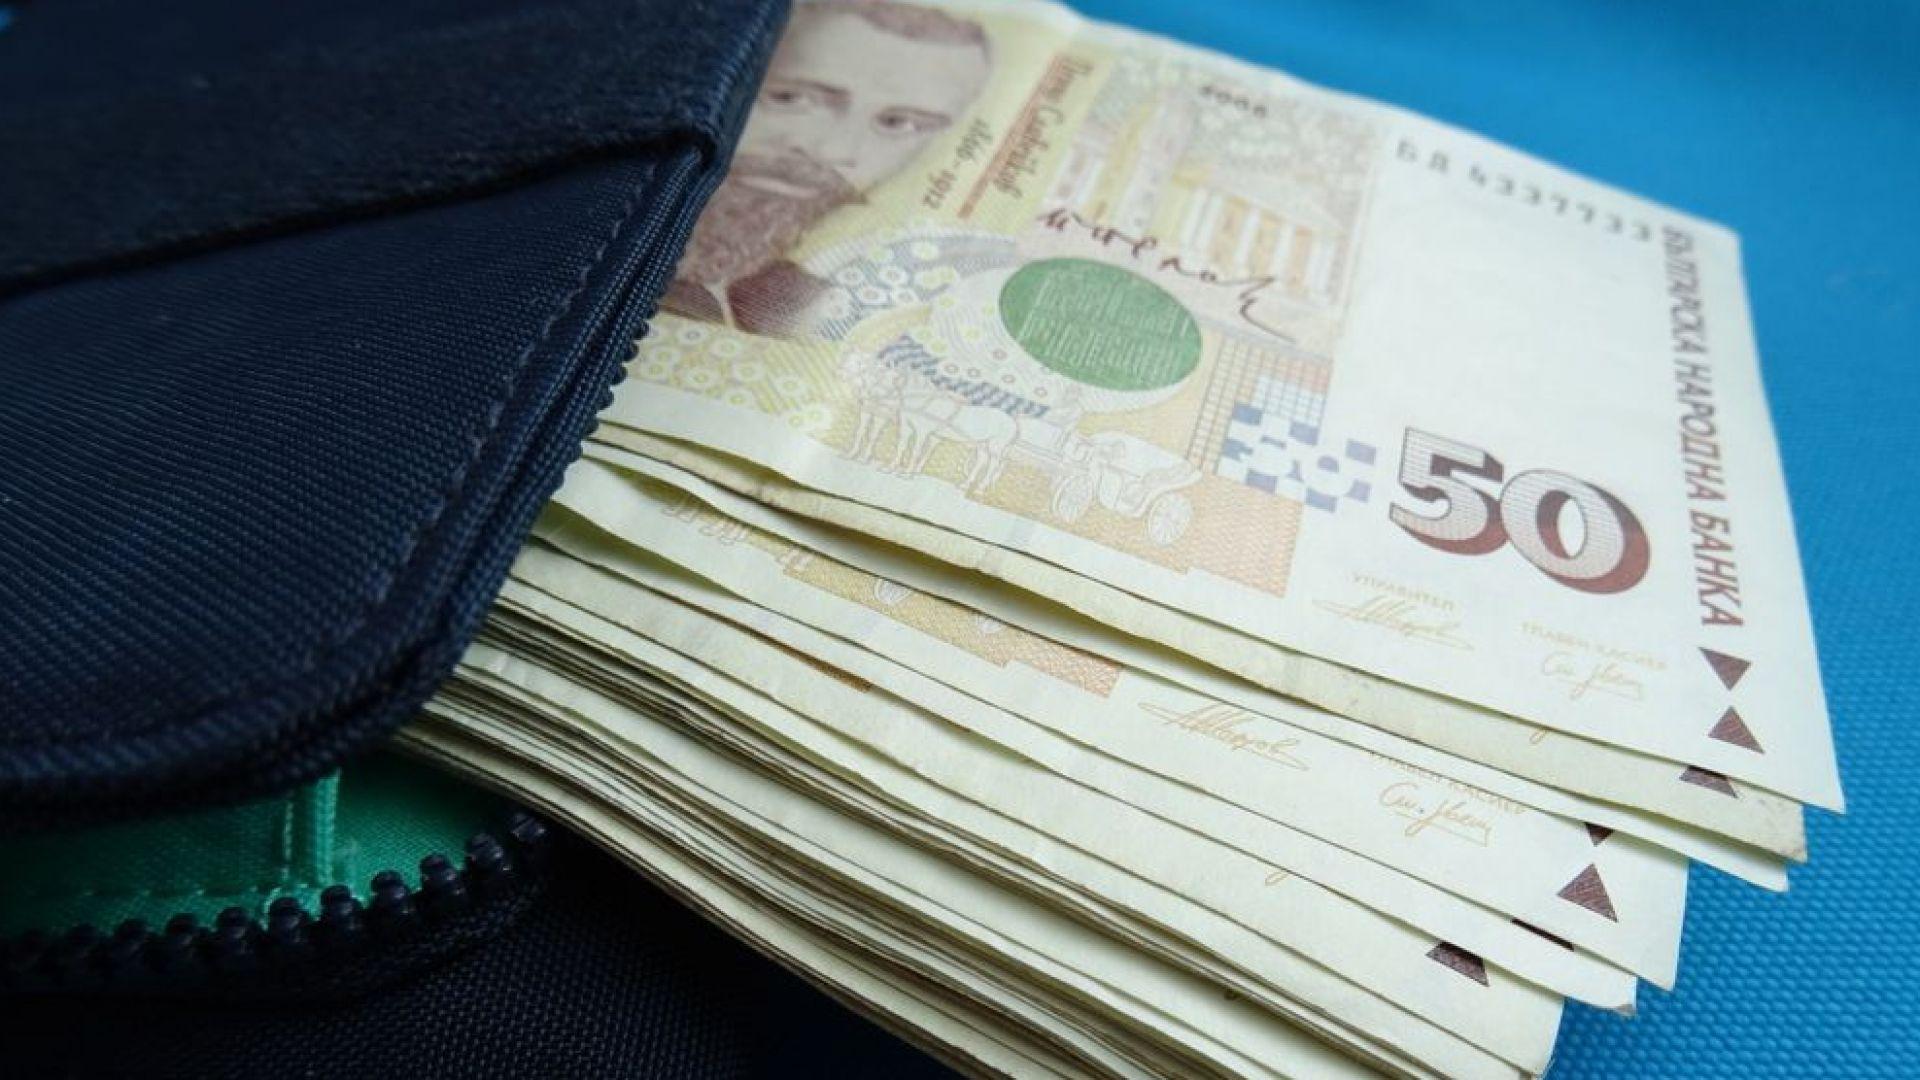 НСИ изчисли 1407 лв. среден доход на човек от домакинство